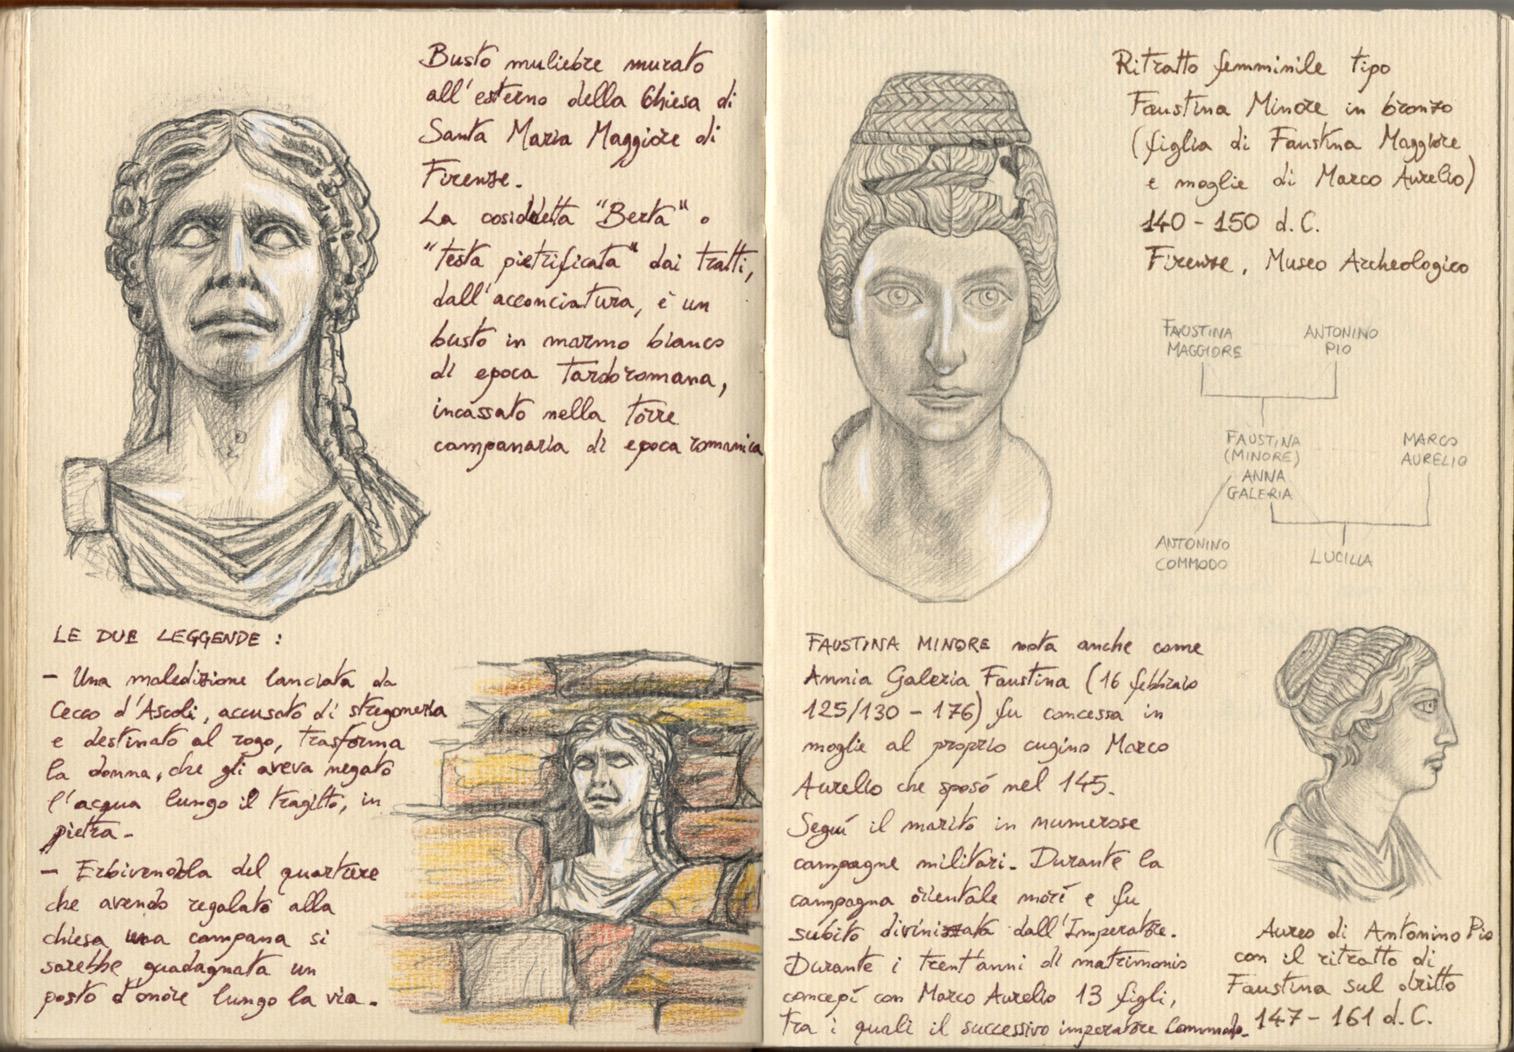 Late Roman and Roman portraits by Panaiotis